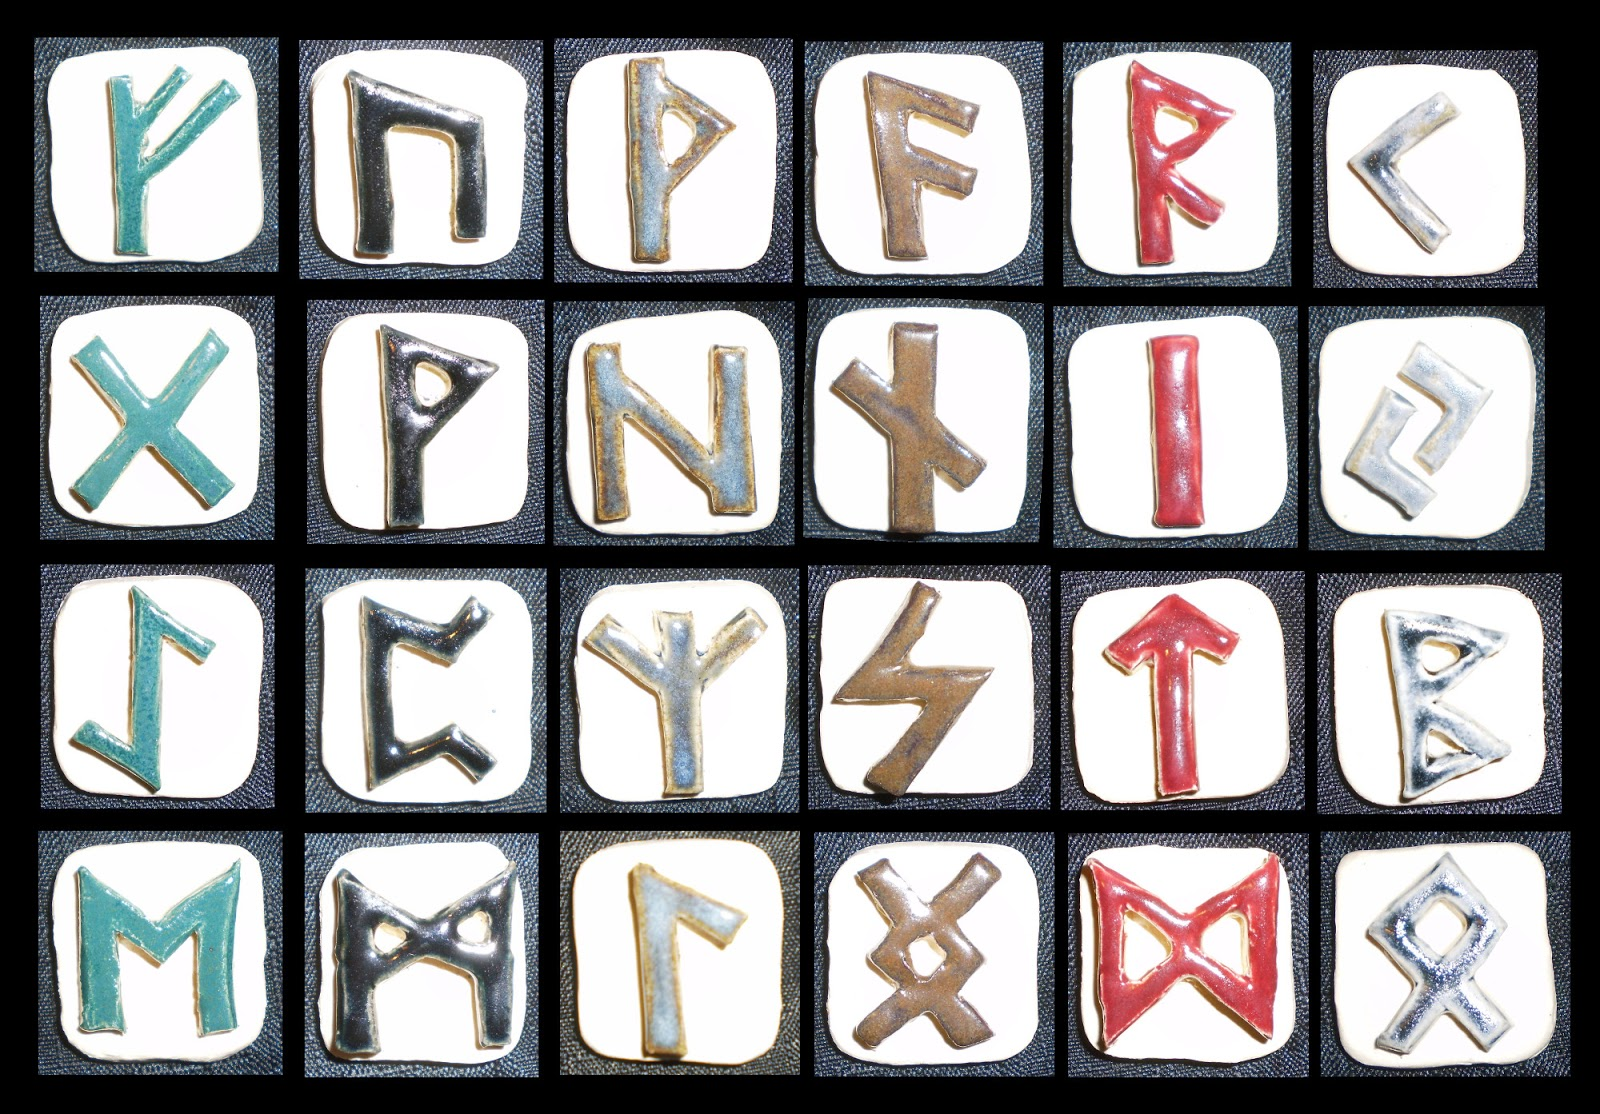 Aberrant Ceramics Elder Futhark Rune Alphabet Tiles